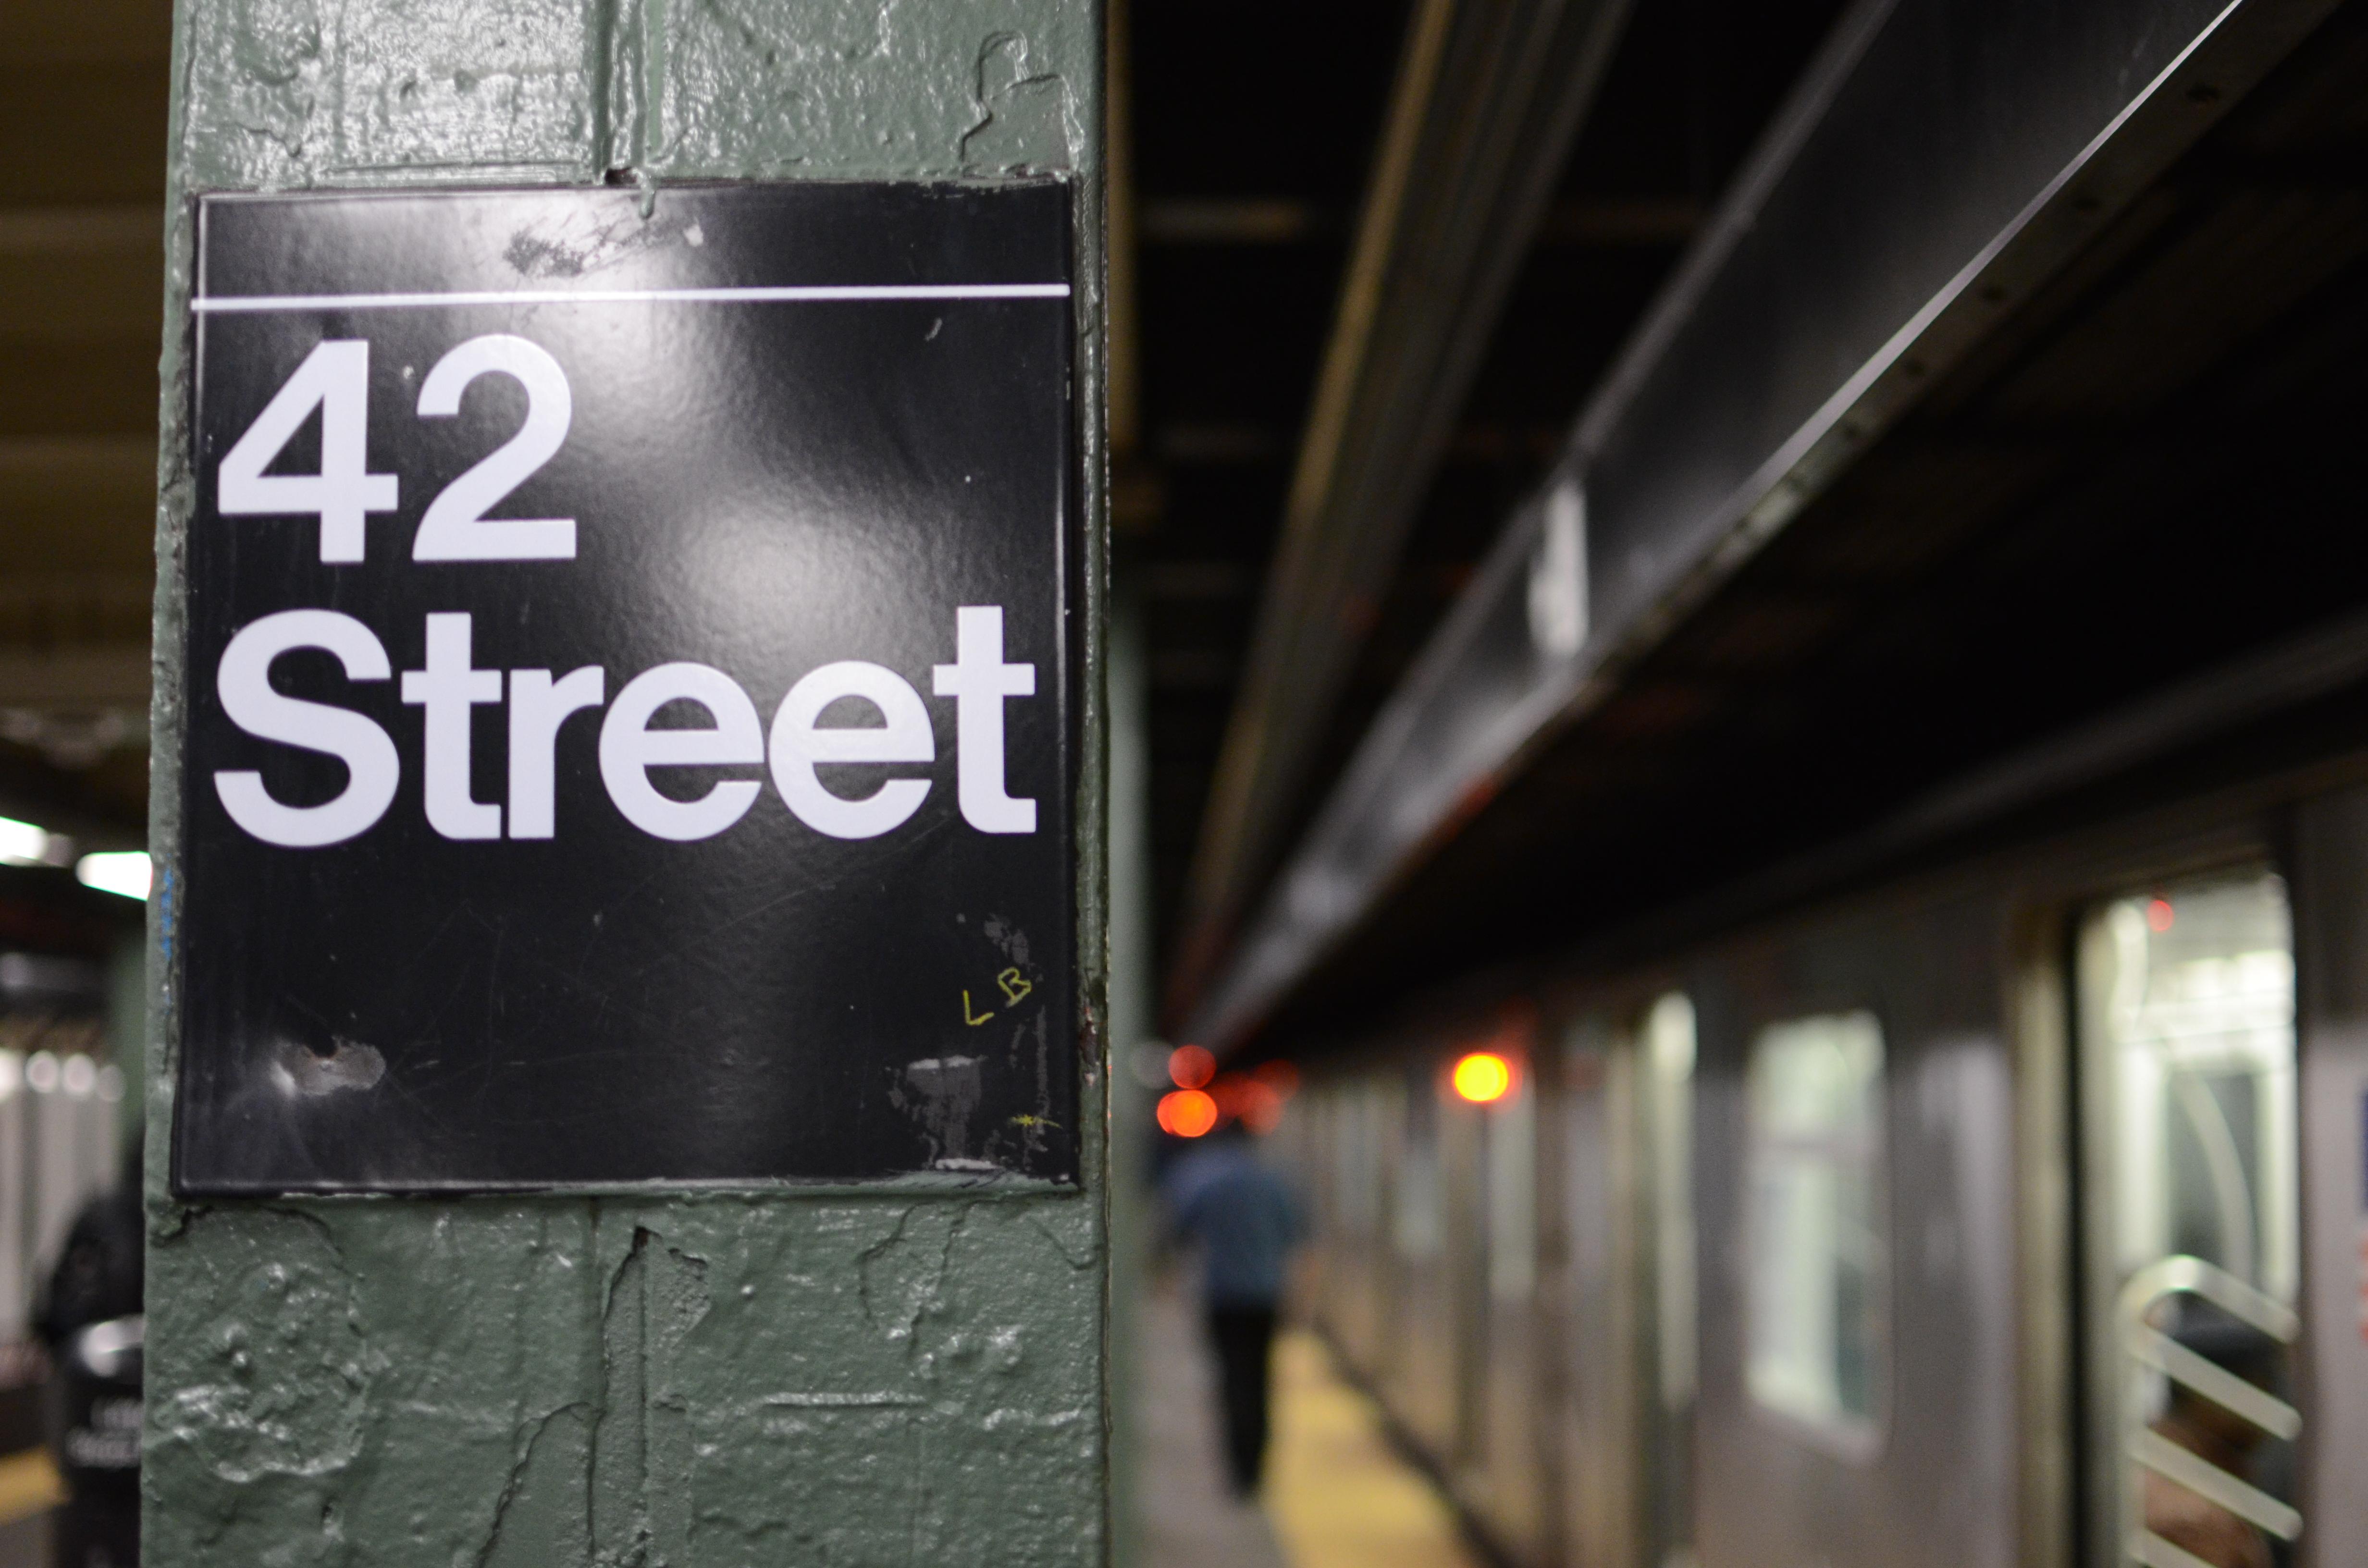 File:42nd Street sign New York subway.JPG - Wikimedia Commons